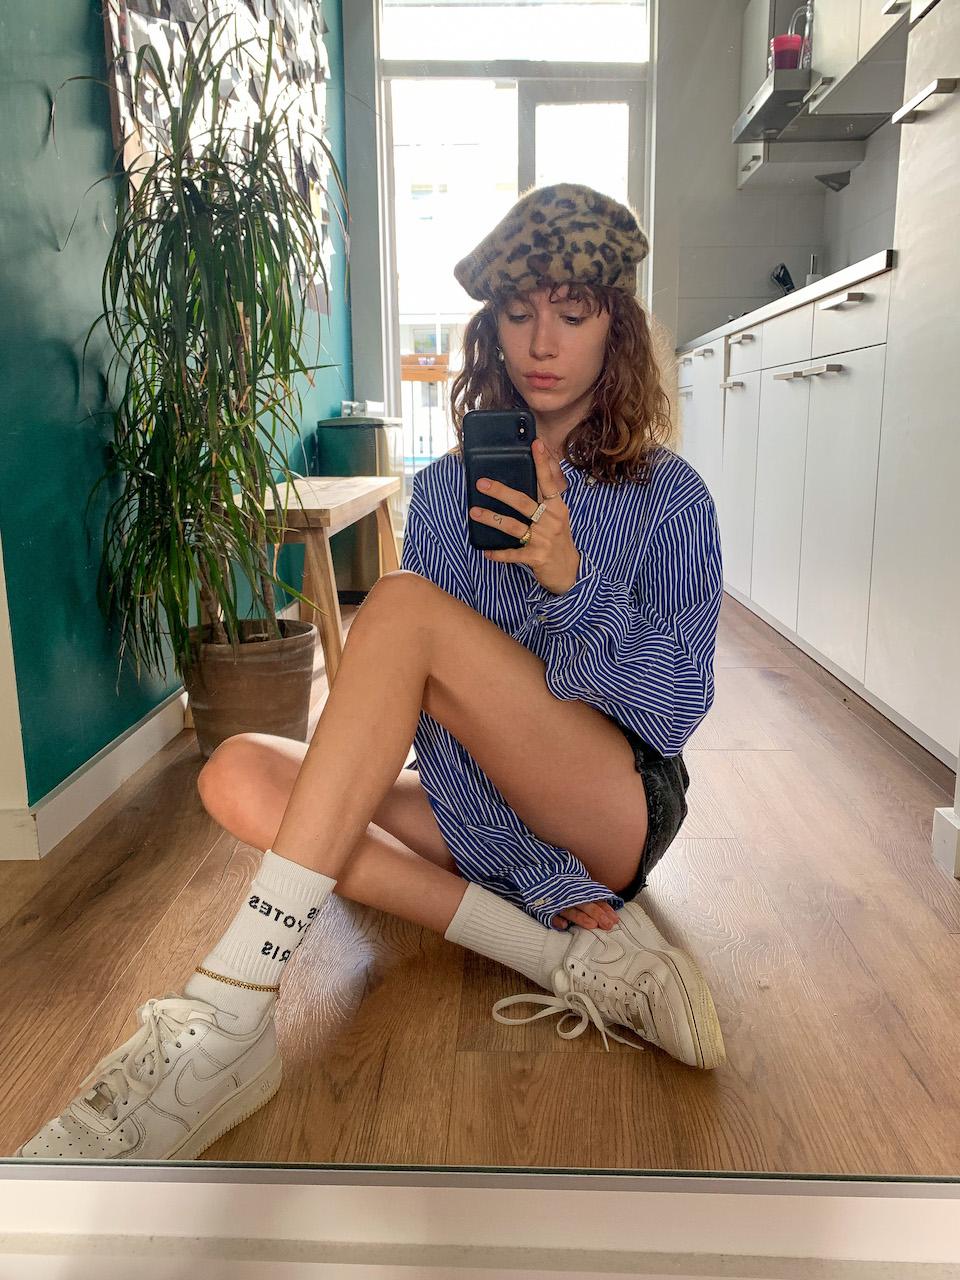 sportsokken trend Pip Peters mode fashionblog